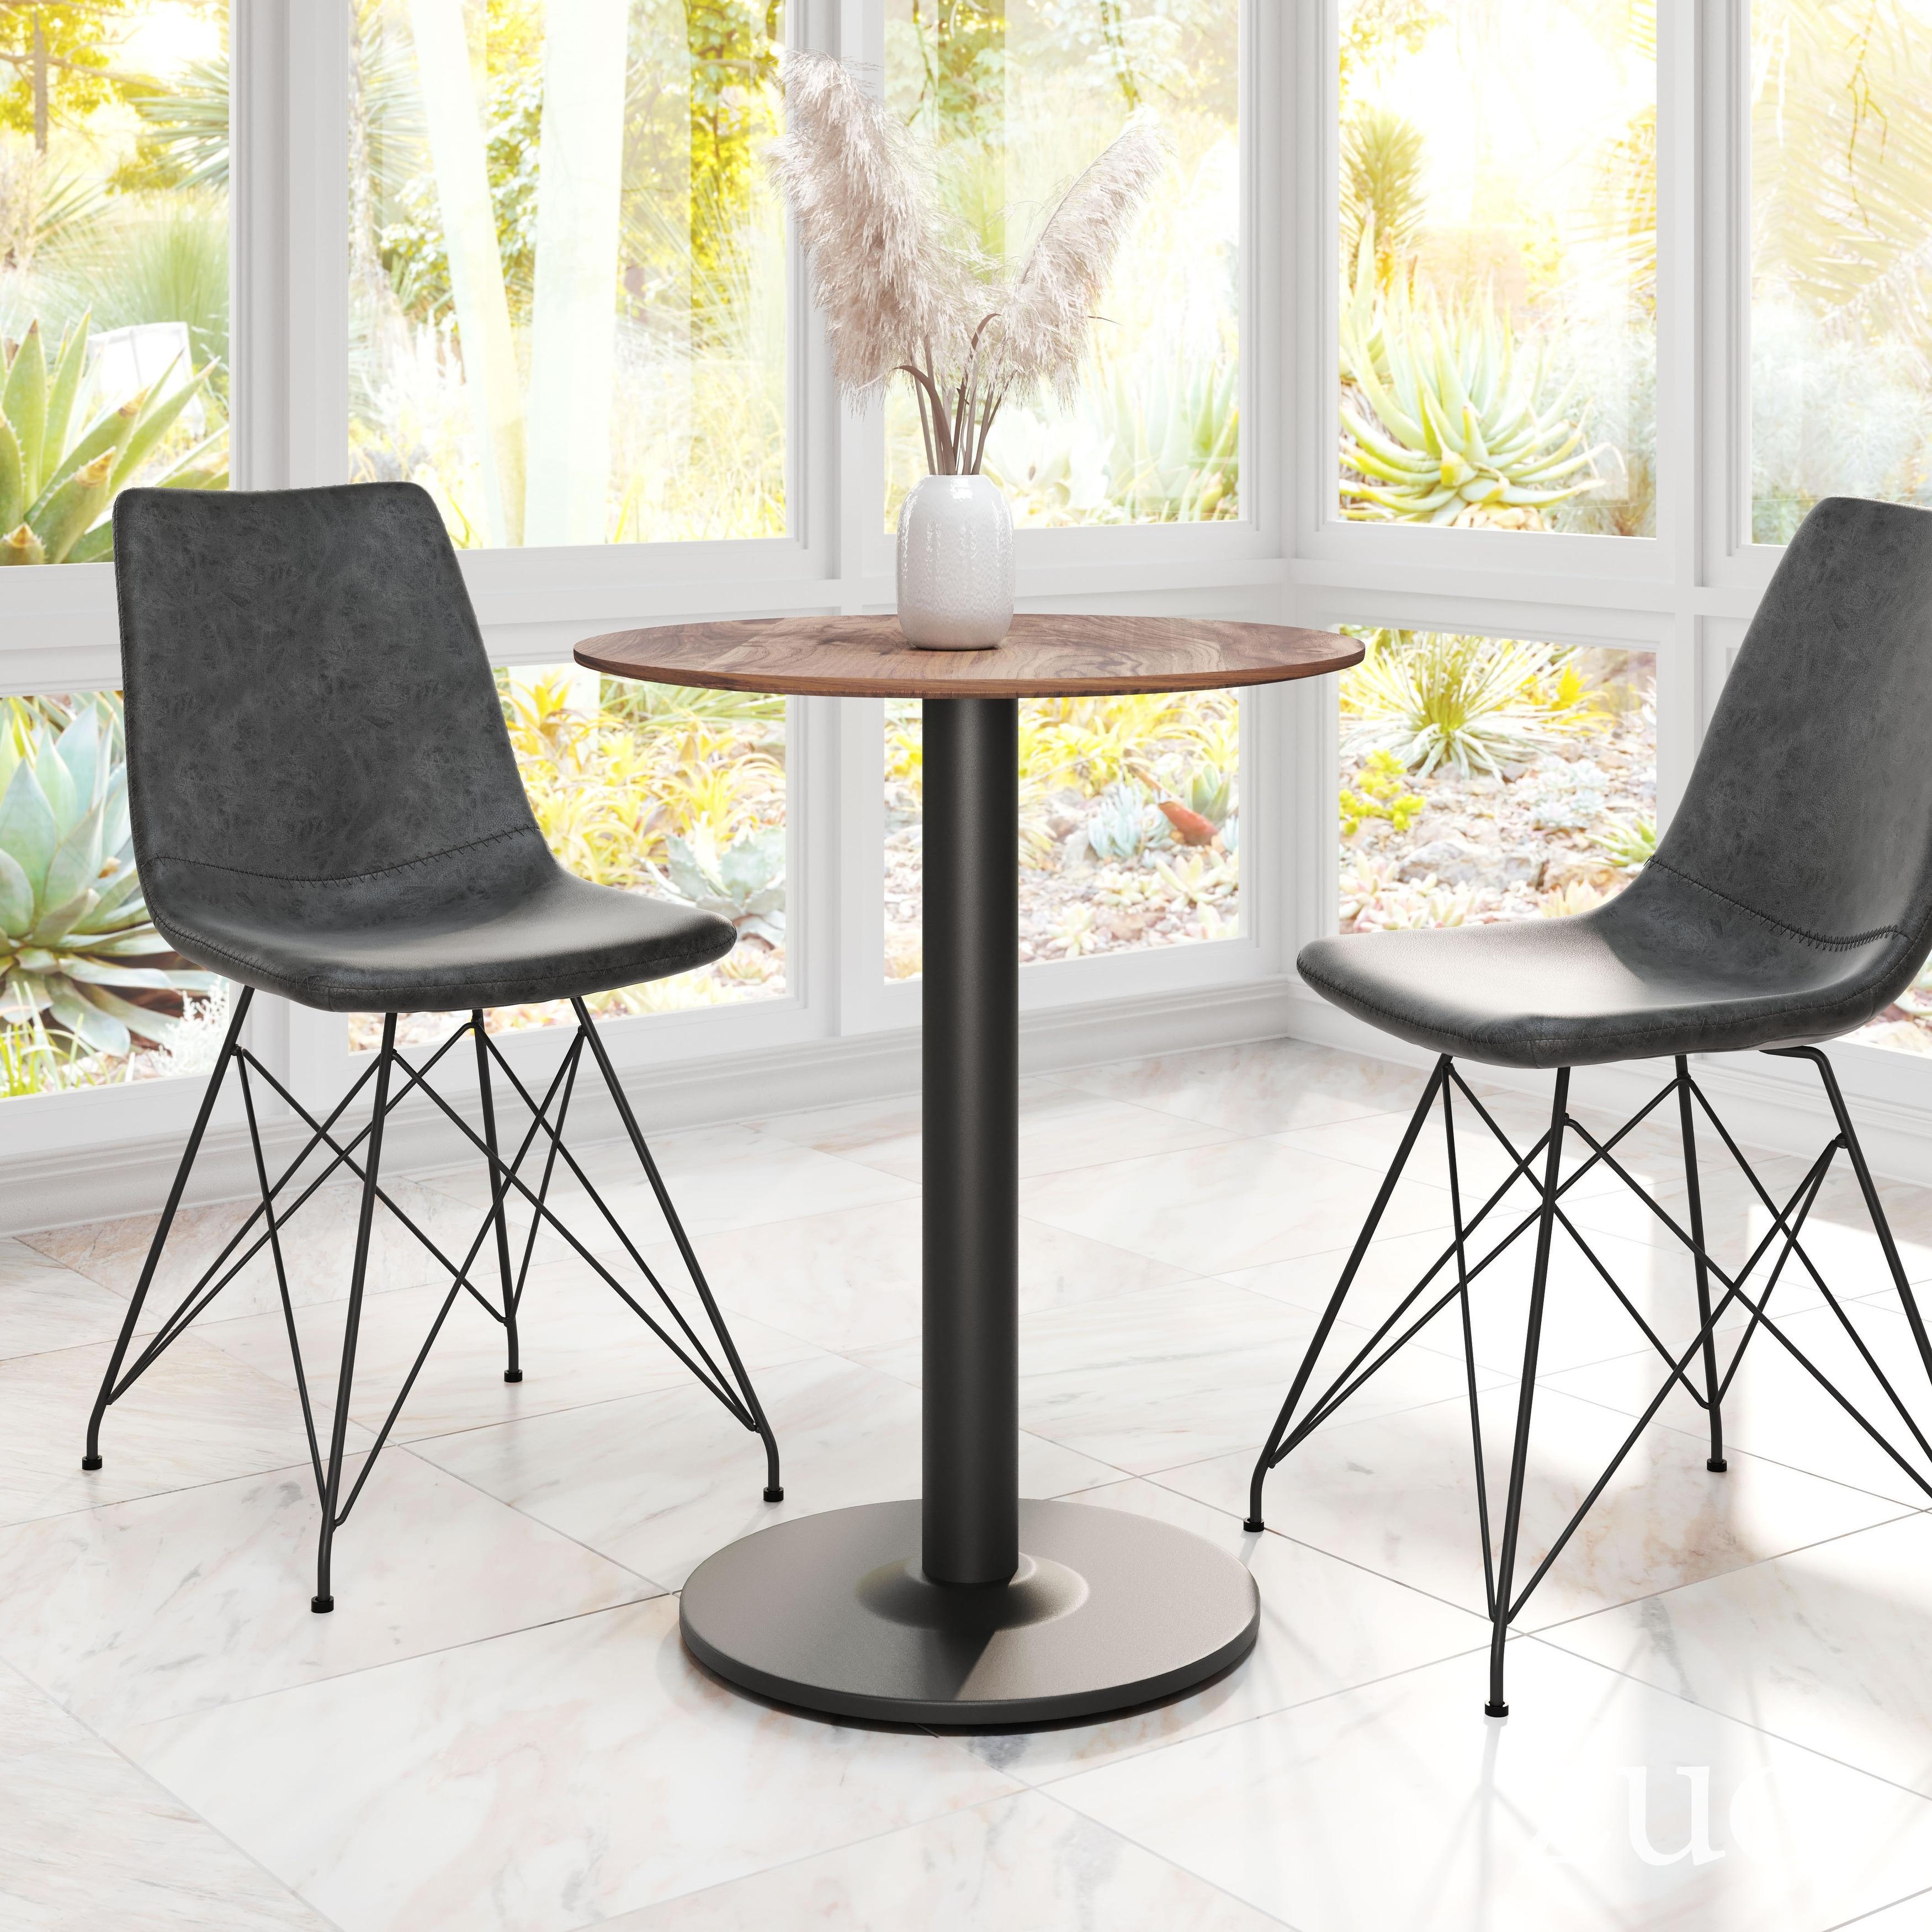 Alto Bistro Table Overstock 31477274